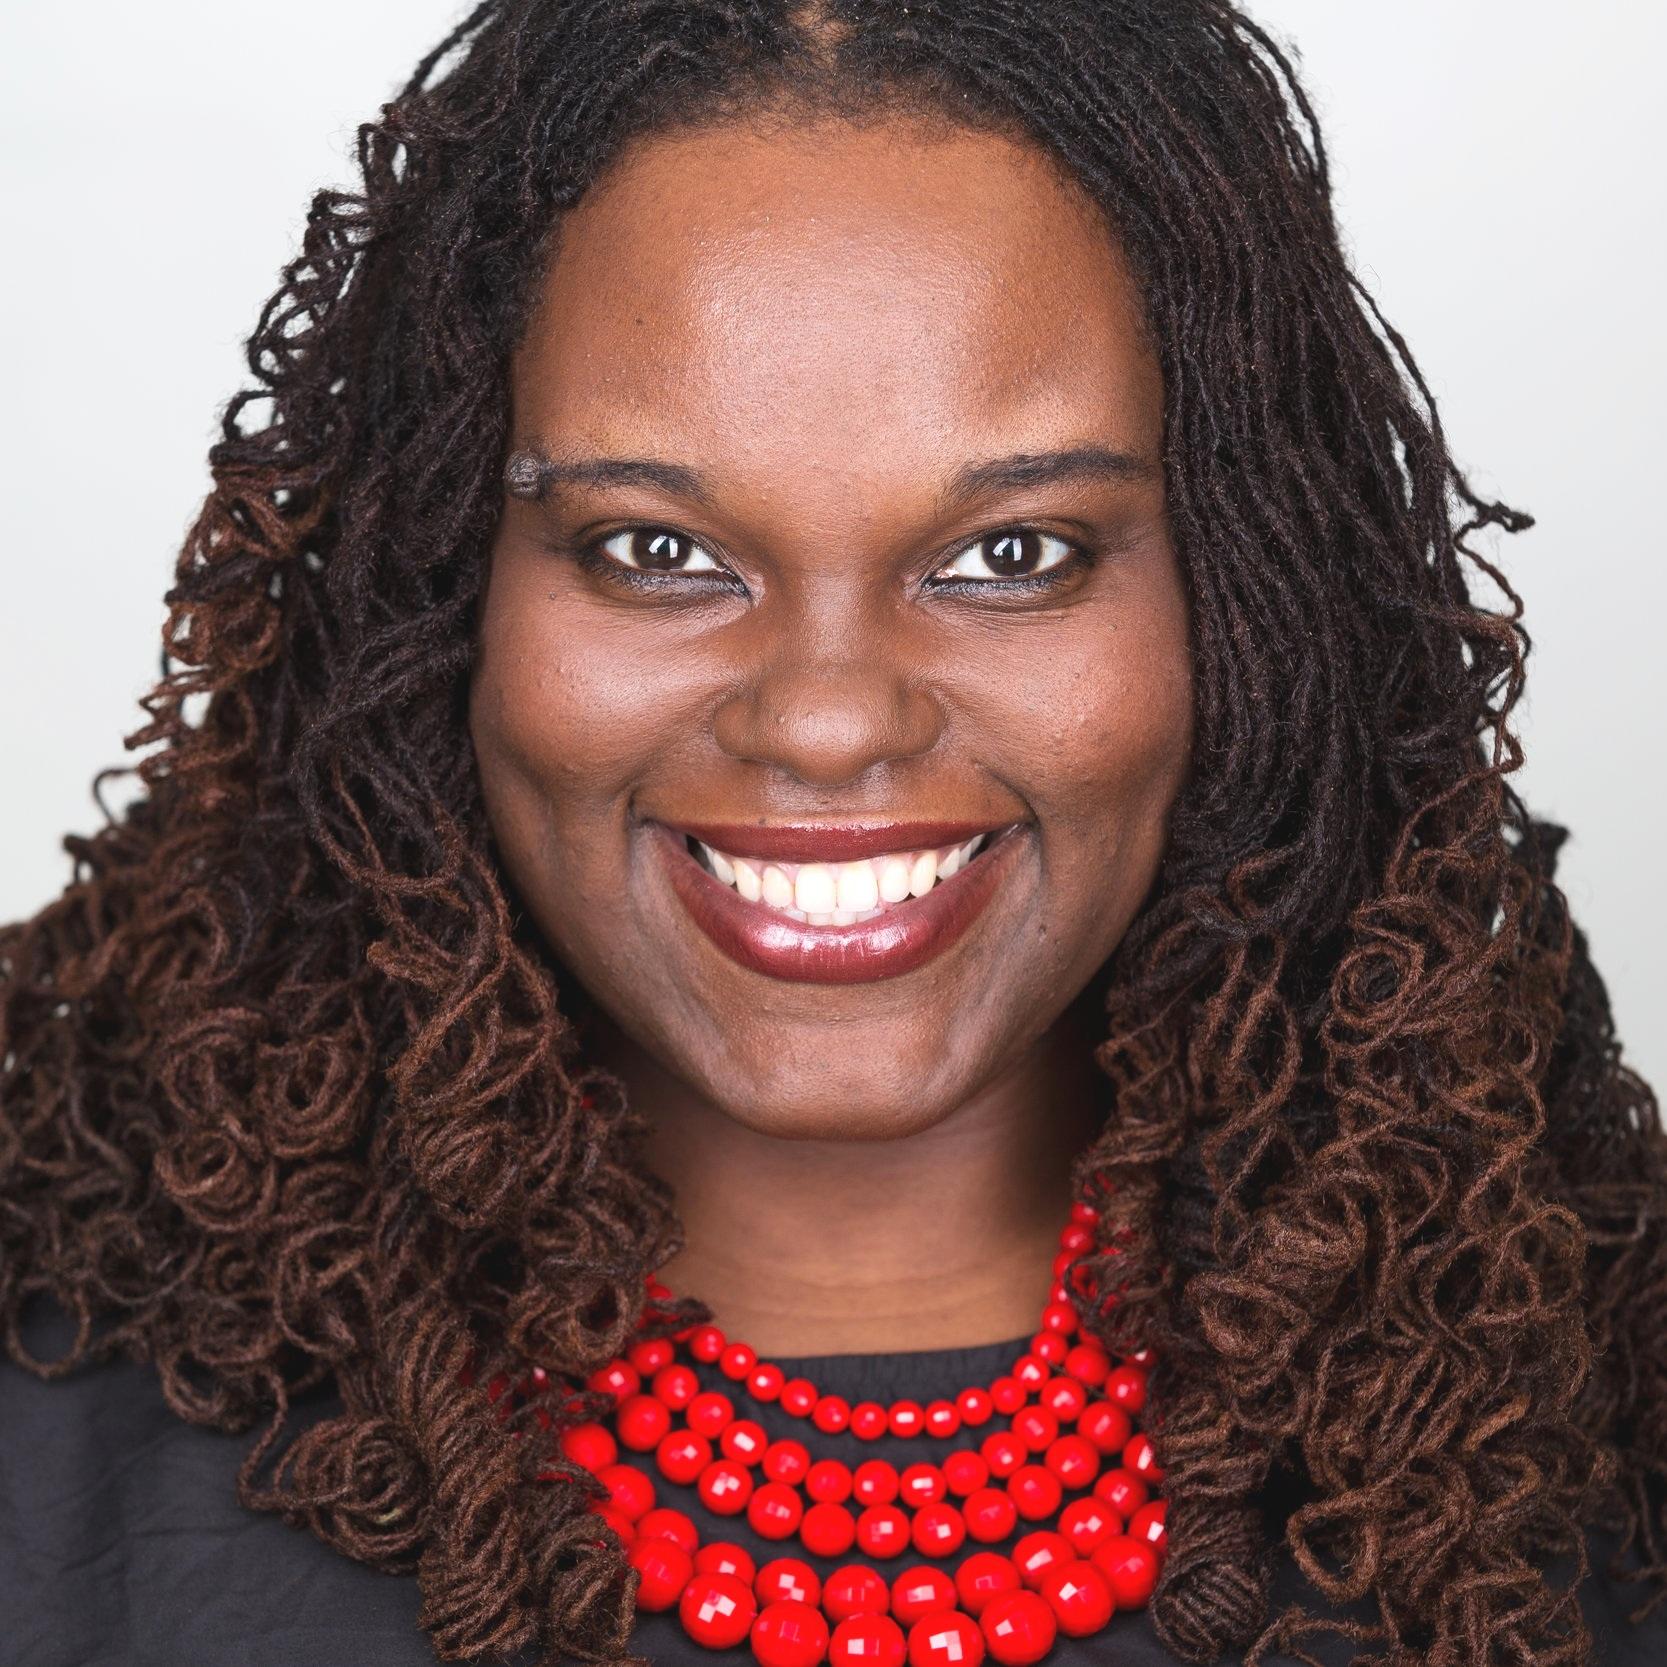 Olivia Sanders - Journalist and founder of O Girl Media